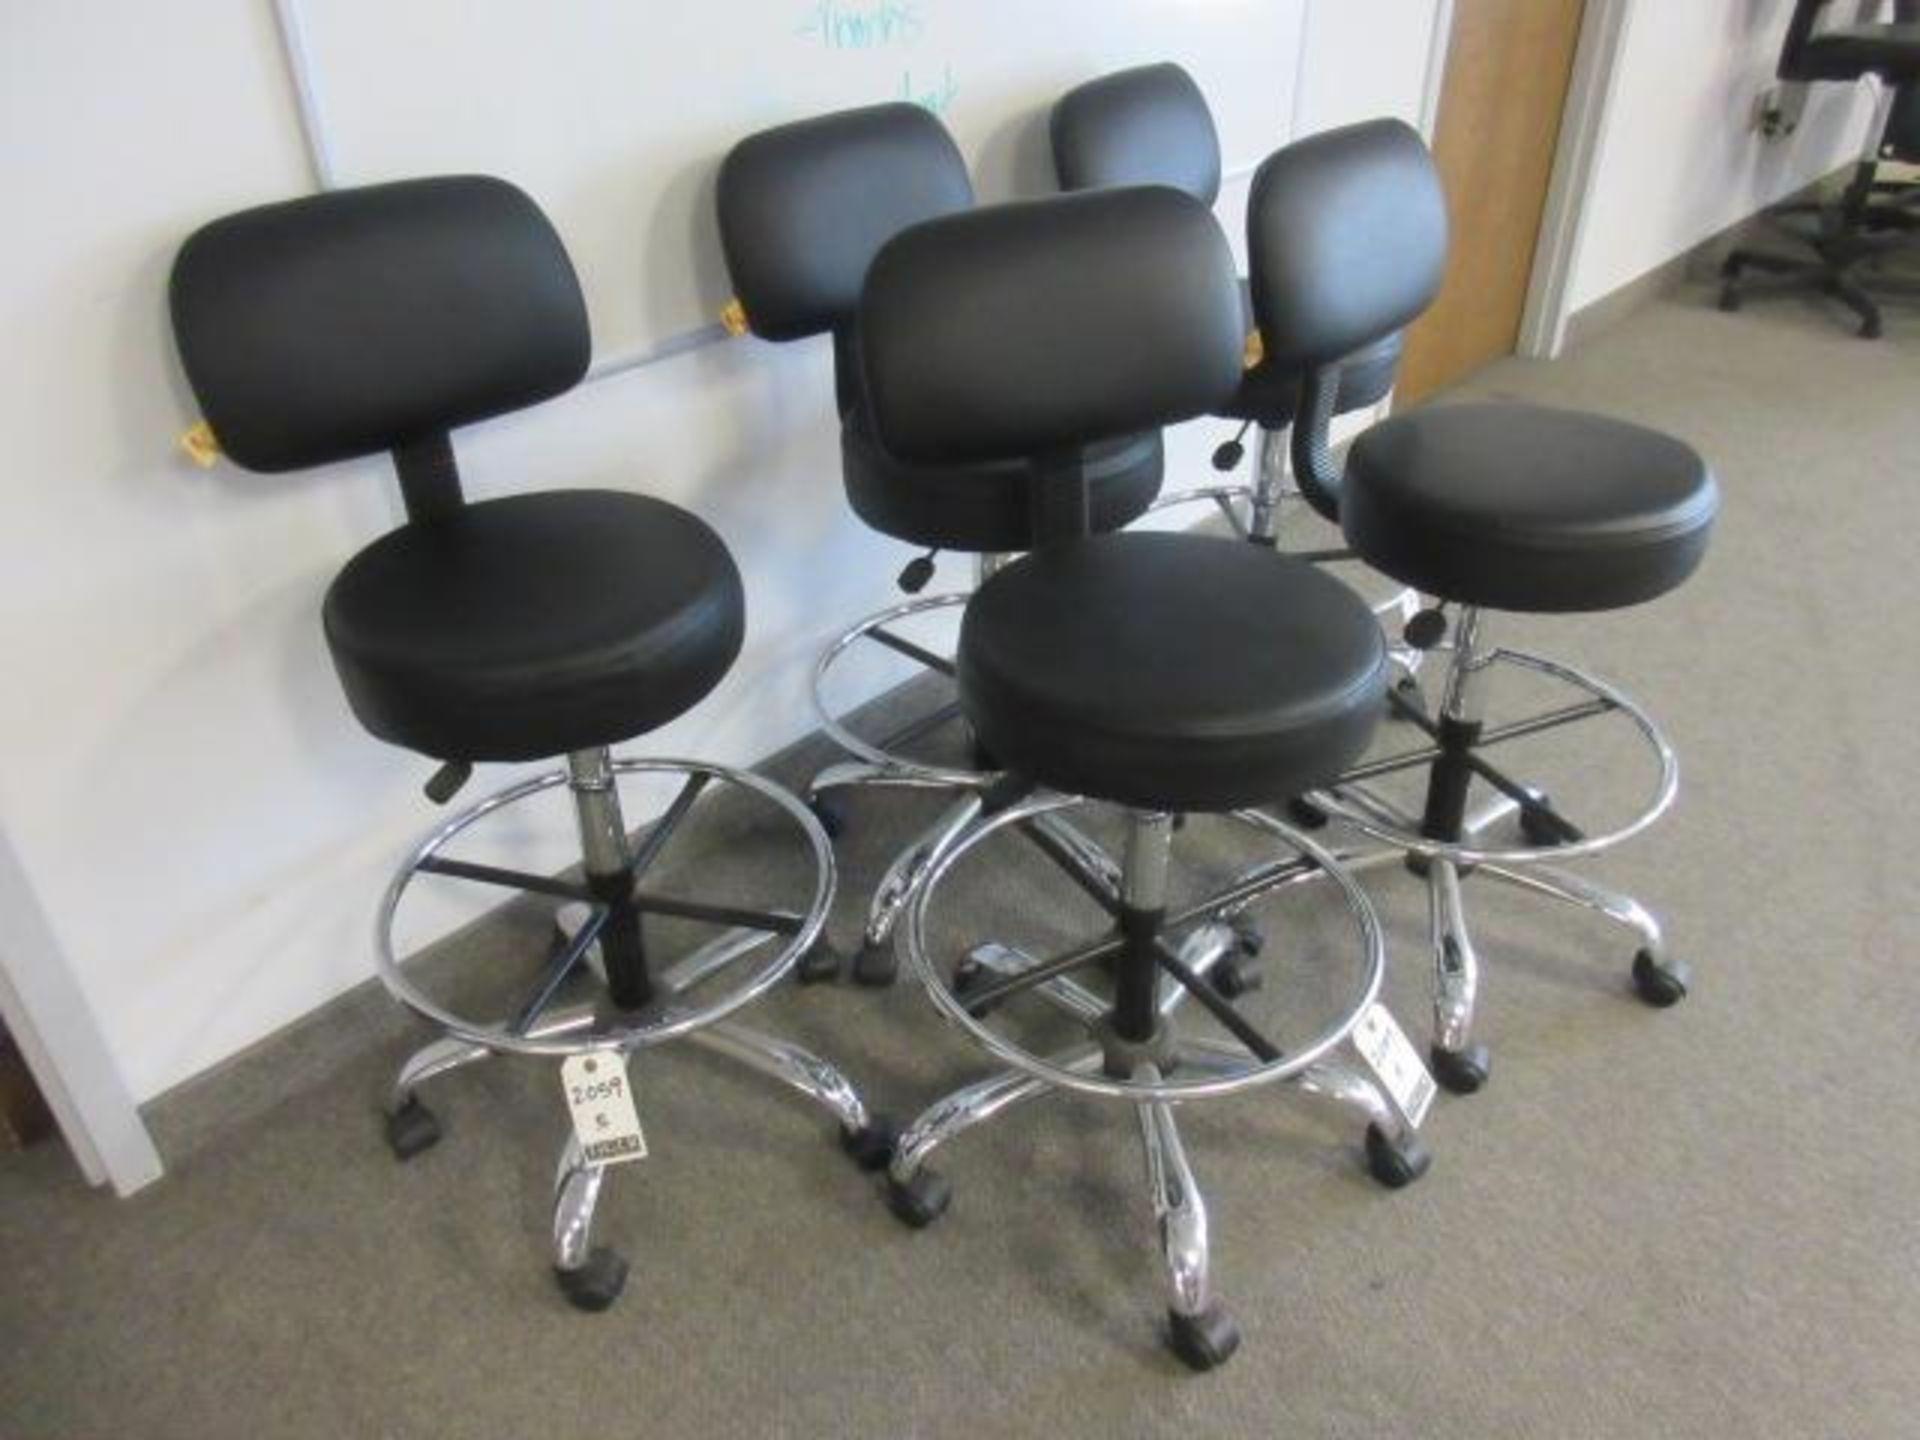 Black Lab Chairs-Swivel Base - Image 3 of 4